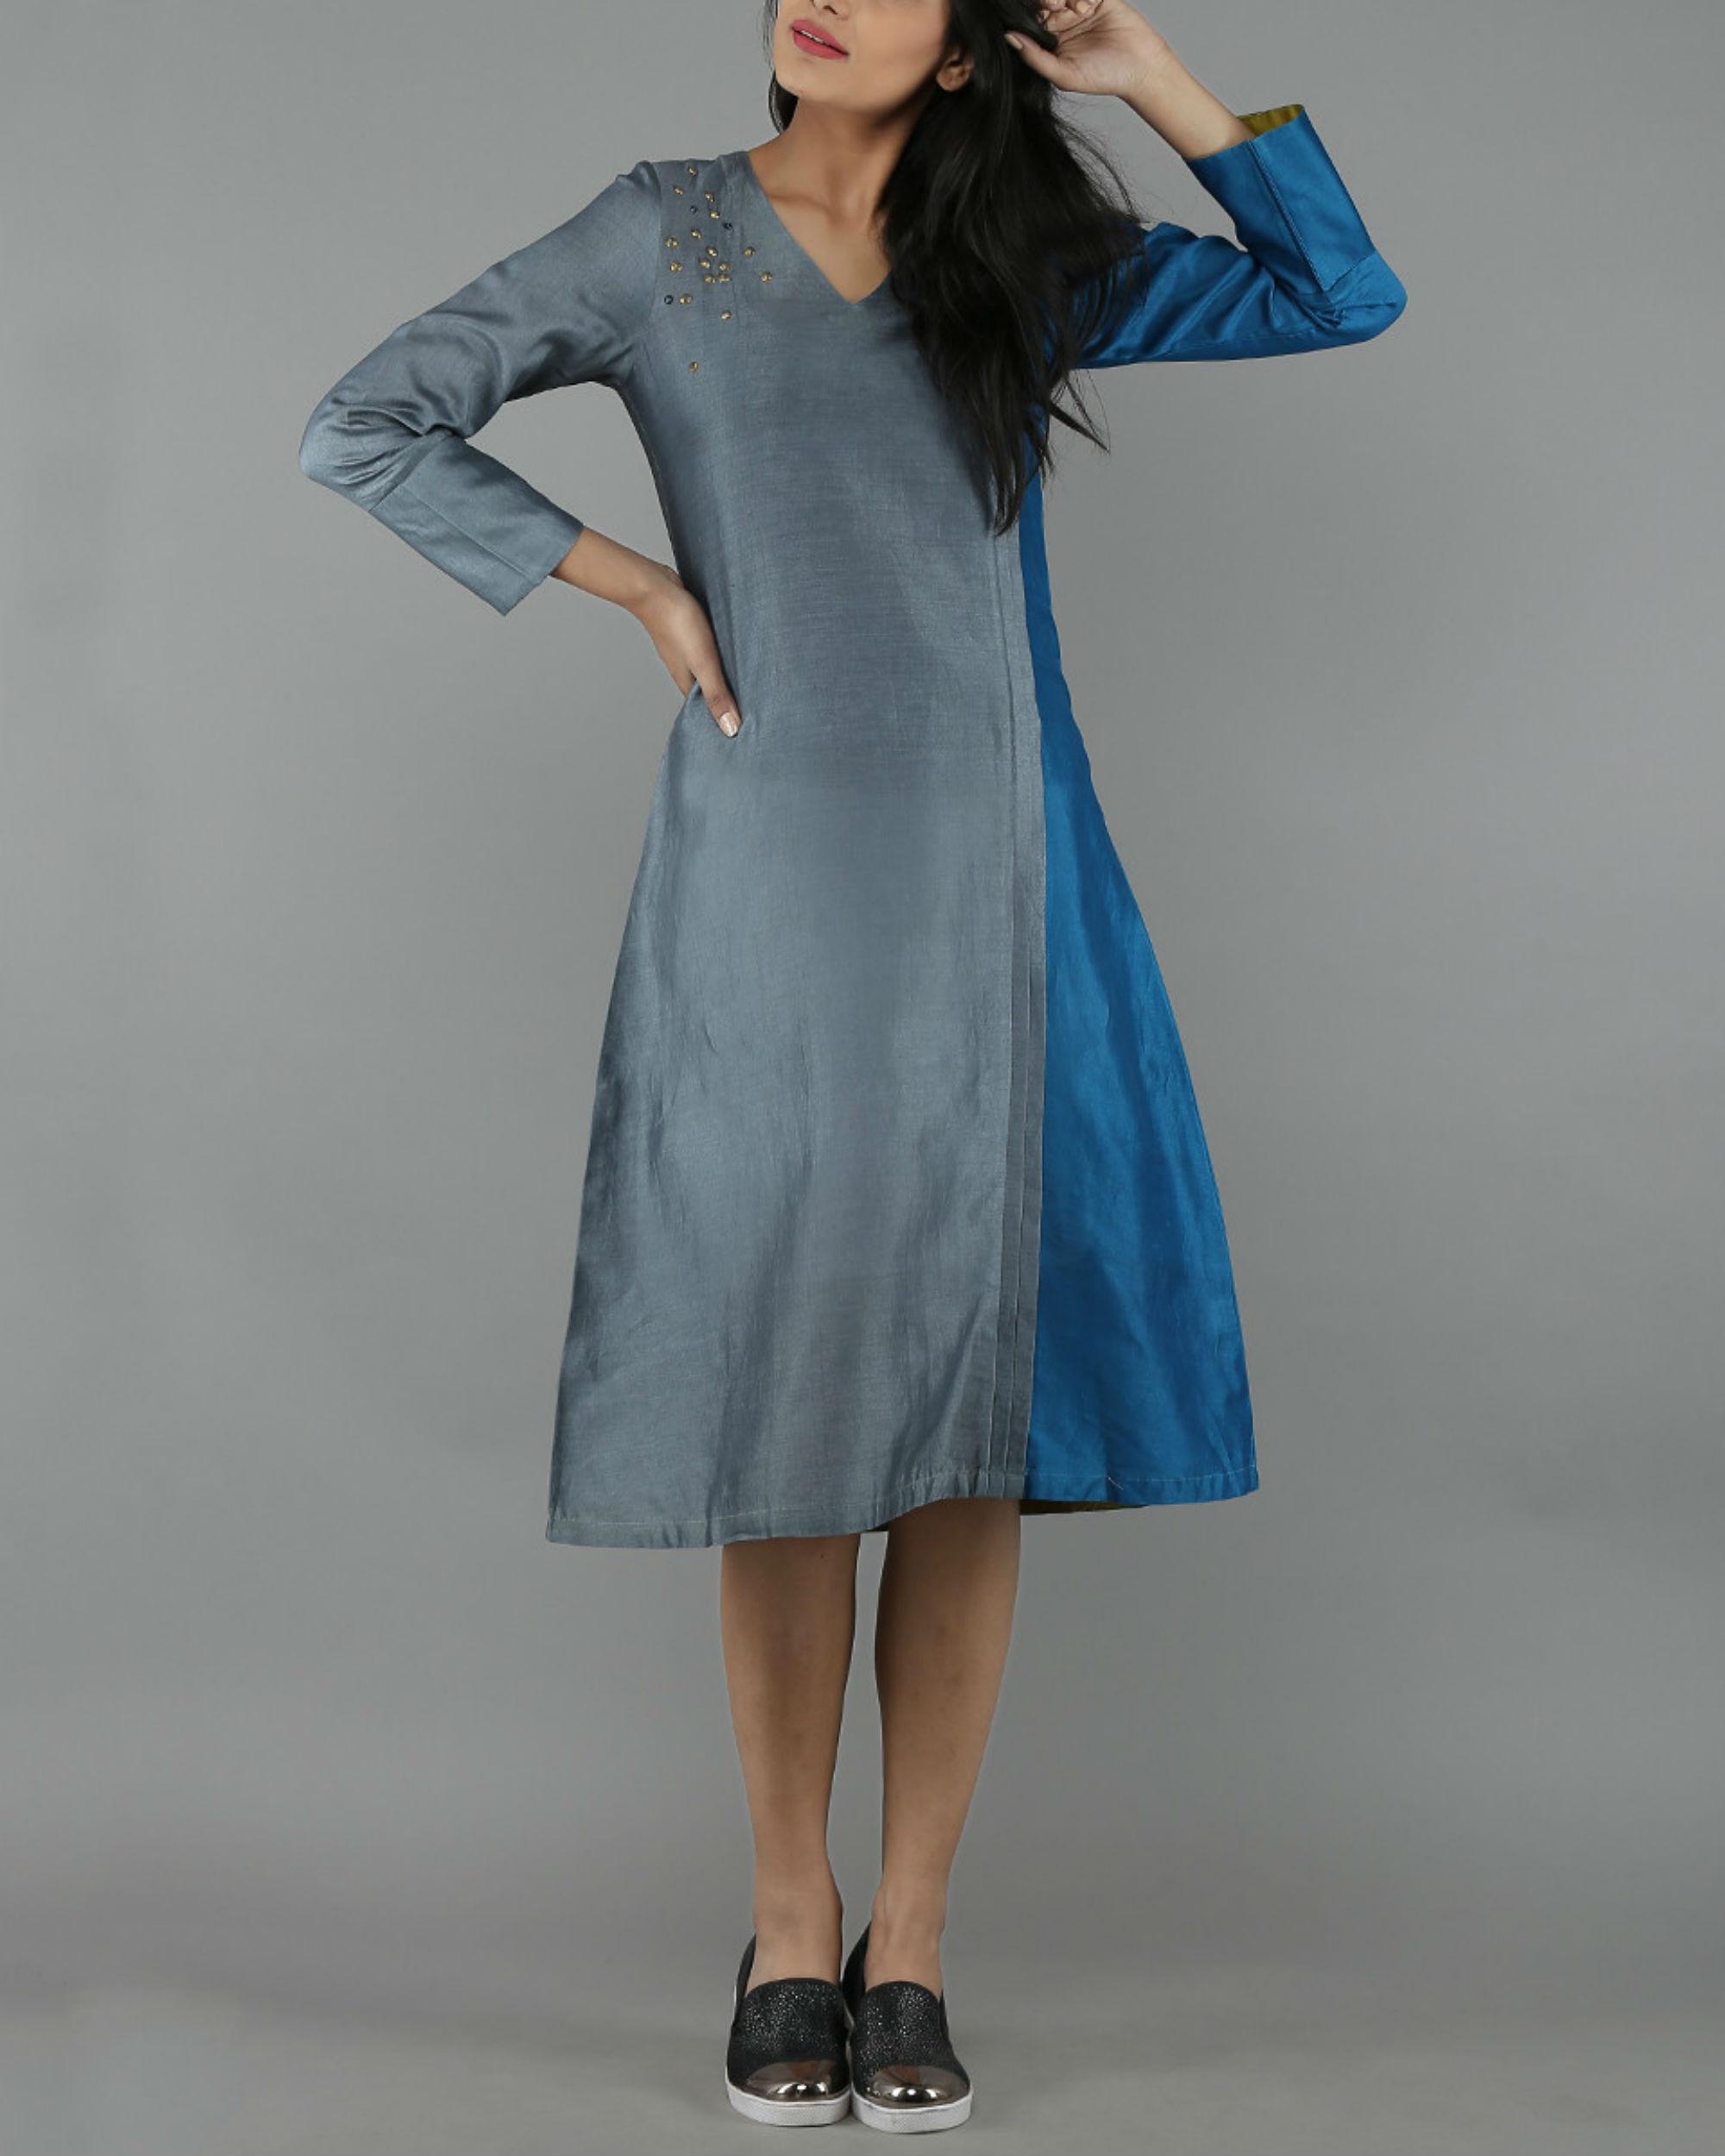 Blue and grey chanderi dress